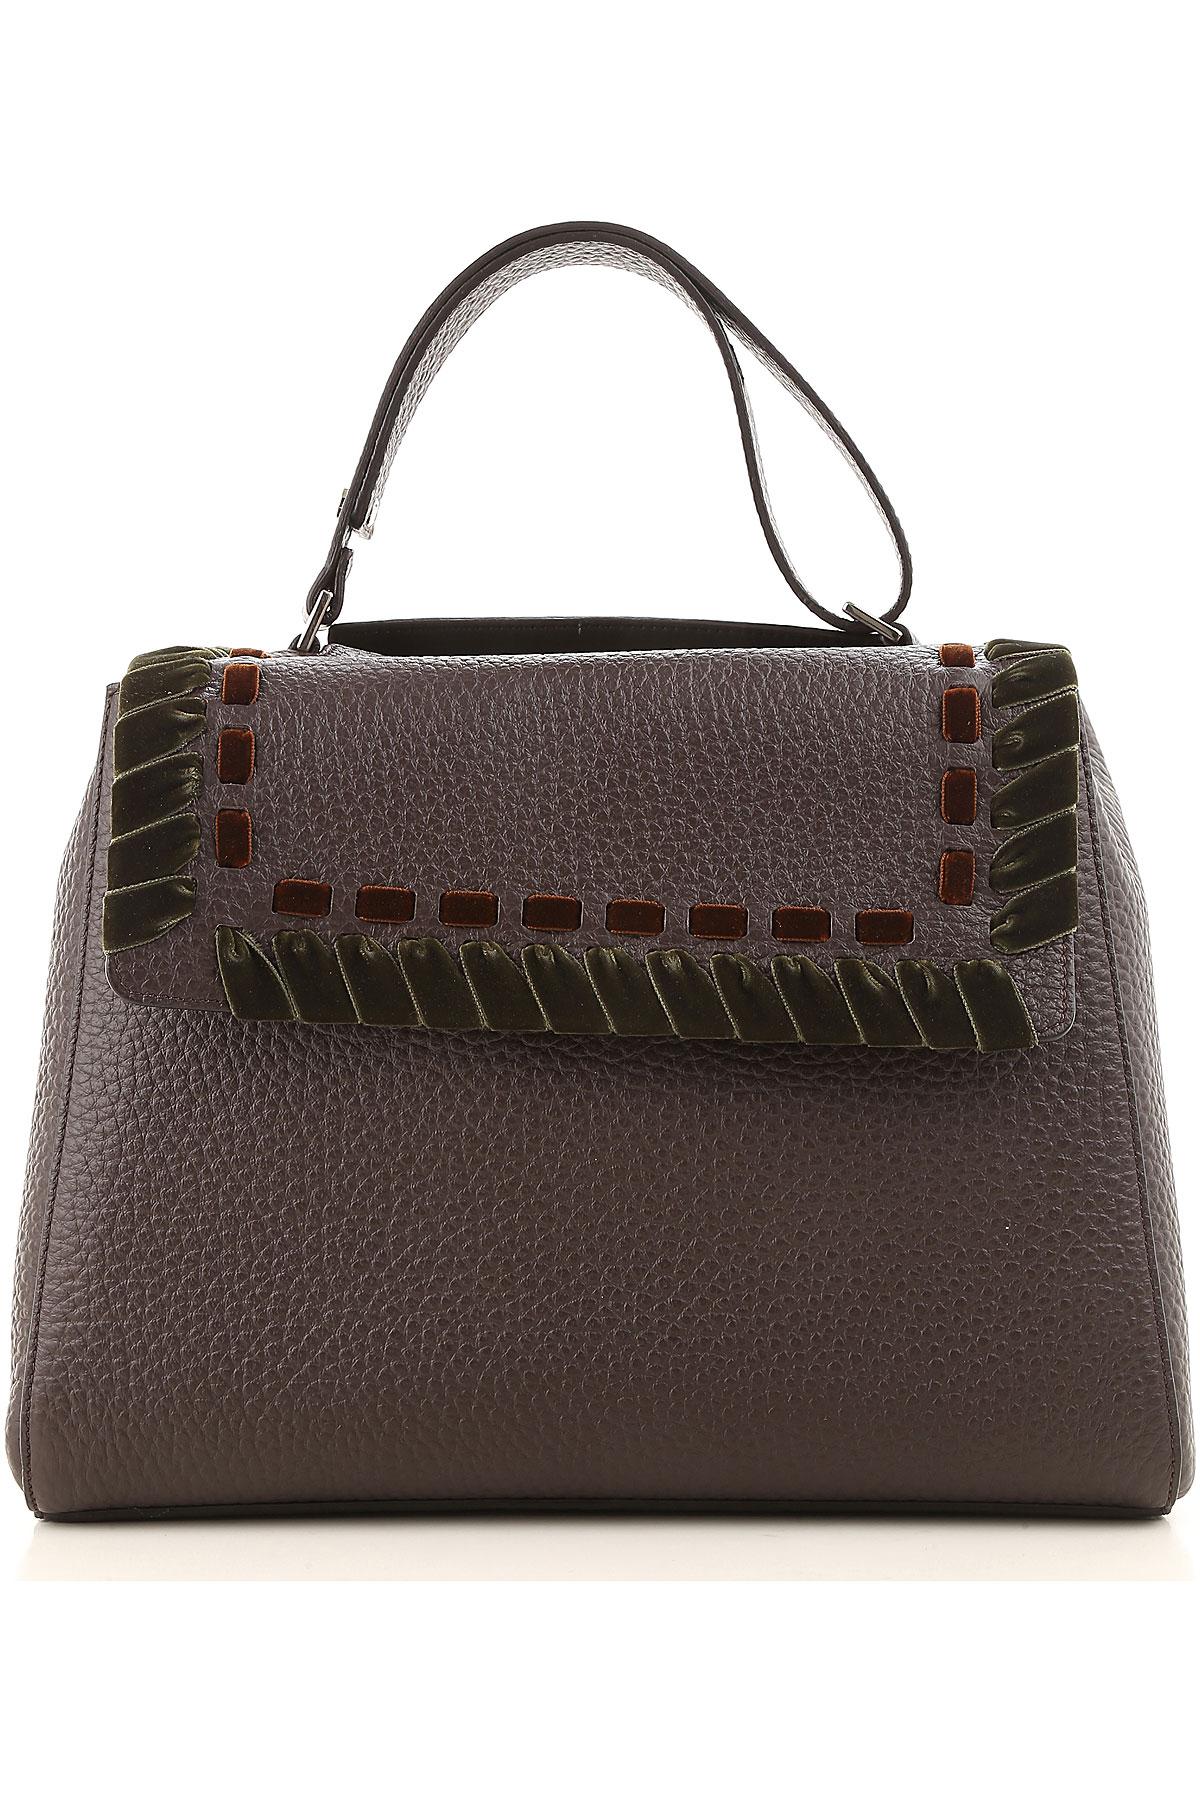 Orciani Top Handle Handbag On Sale, Moro, Leather, 2019